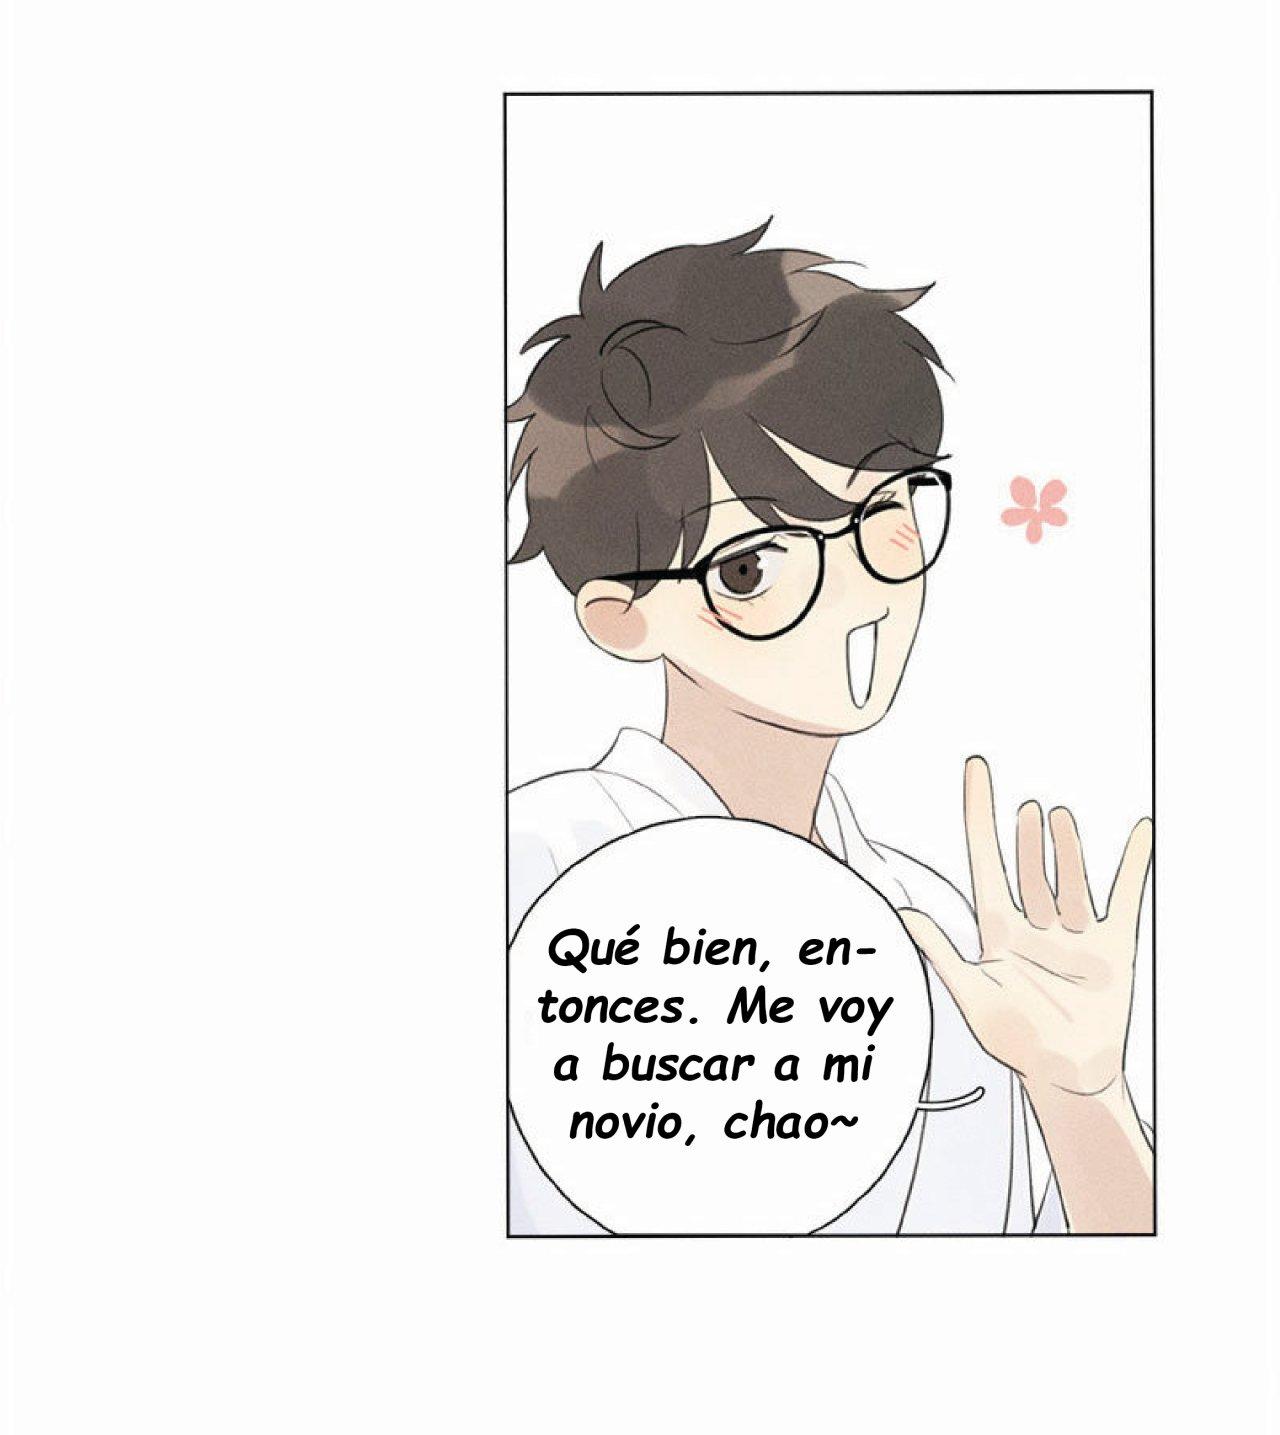 https://nine.mangadogs.com/es_manga/pic8/29/24925/946329/2aa4320da9428380432806ed57ccc966.jpg Page 39